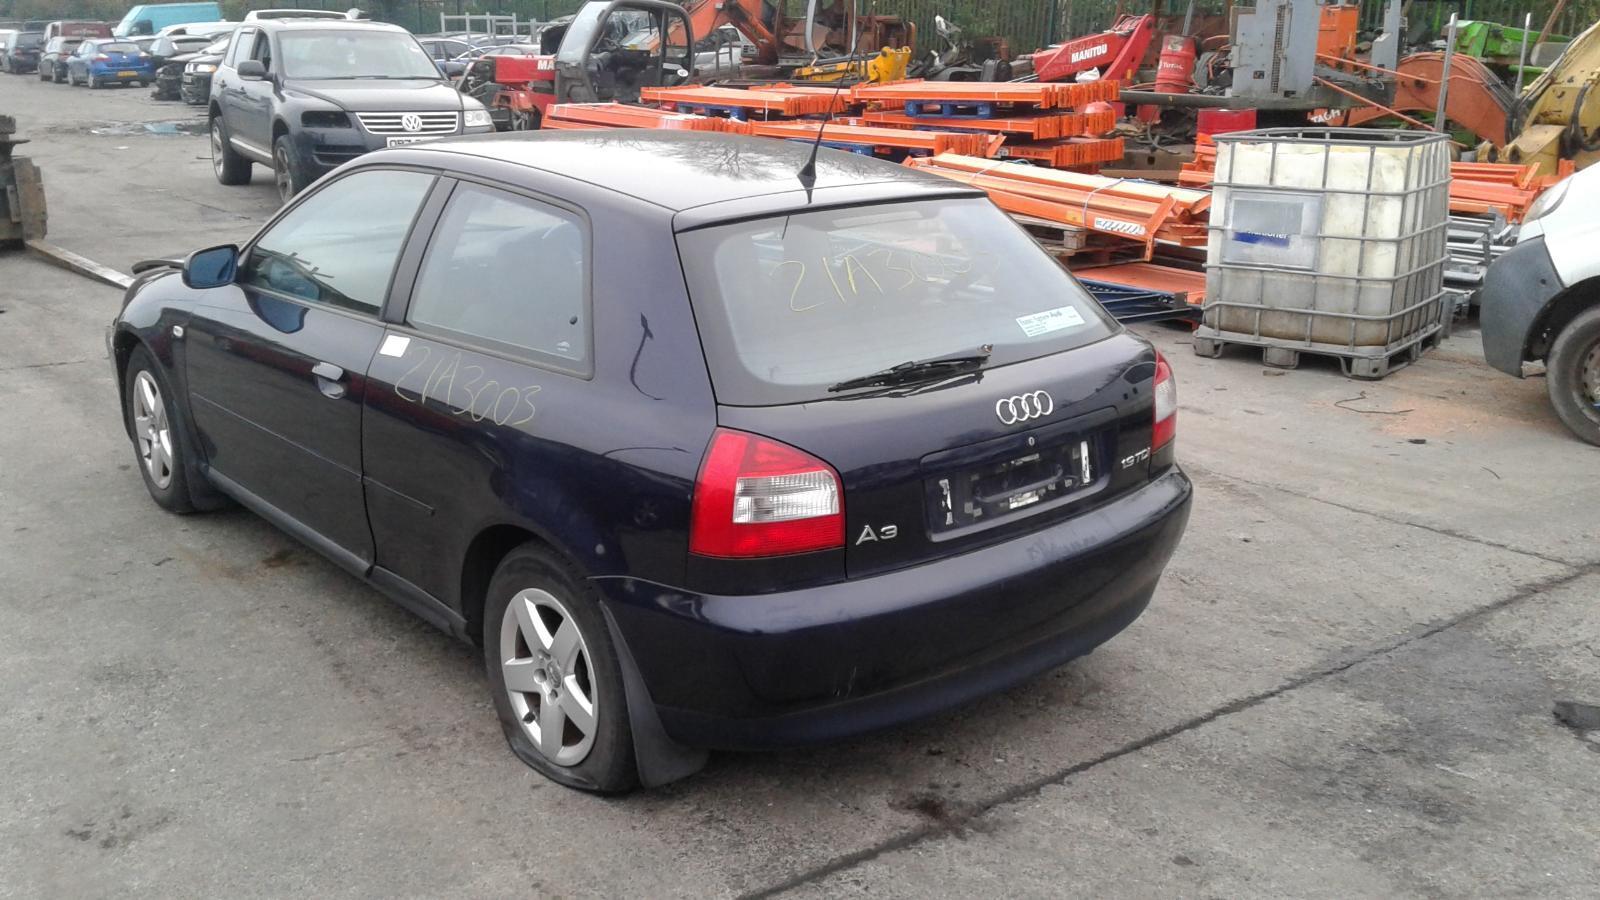 2002 AUDI A3 Image